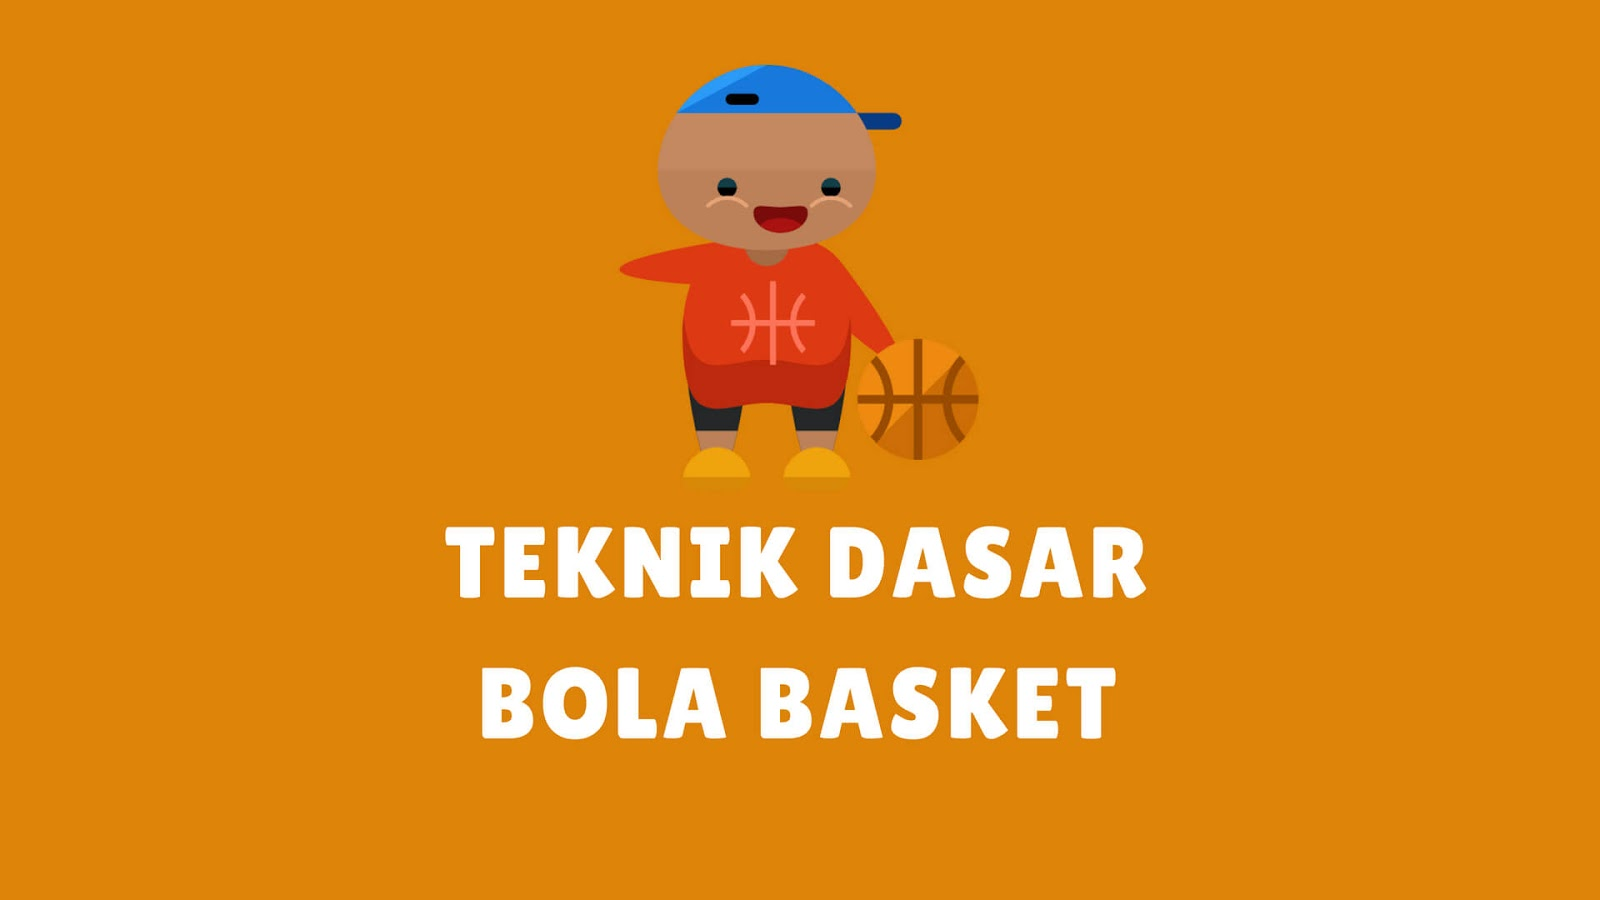 10 Teknik Dasar Permainan Bola Basket Lengkap Gambar